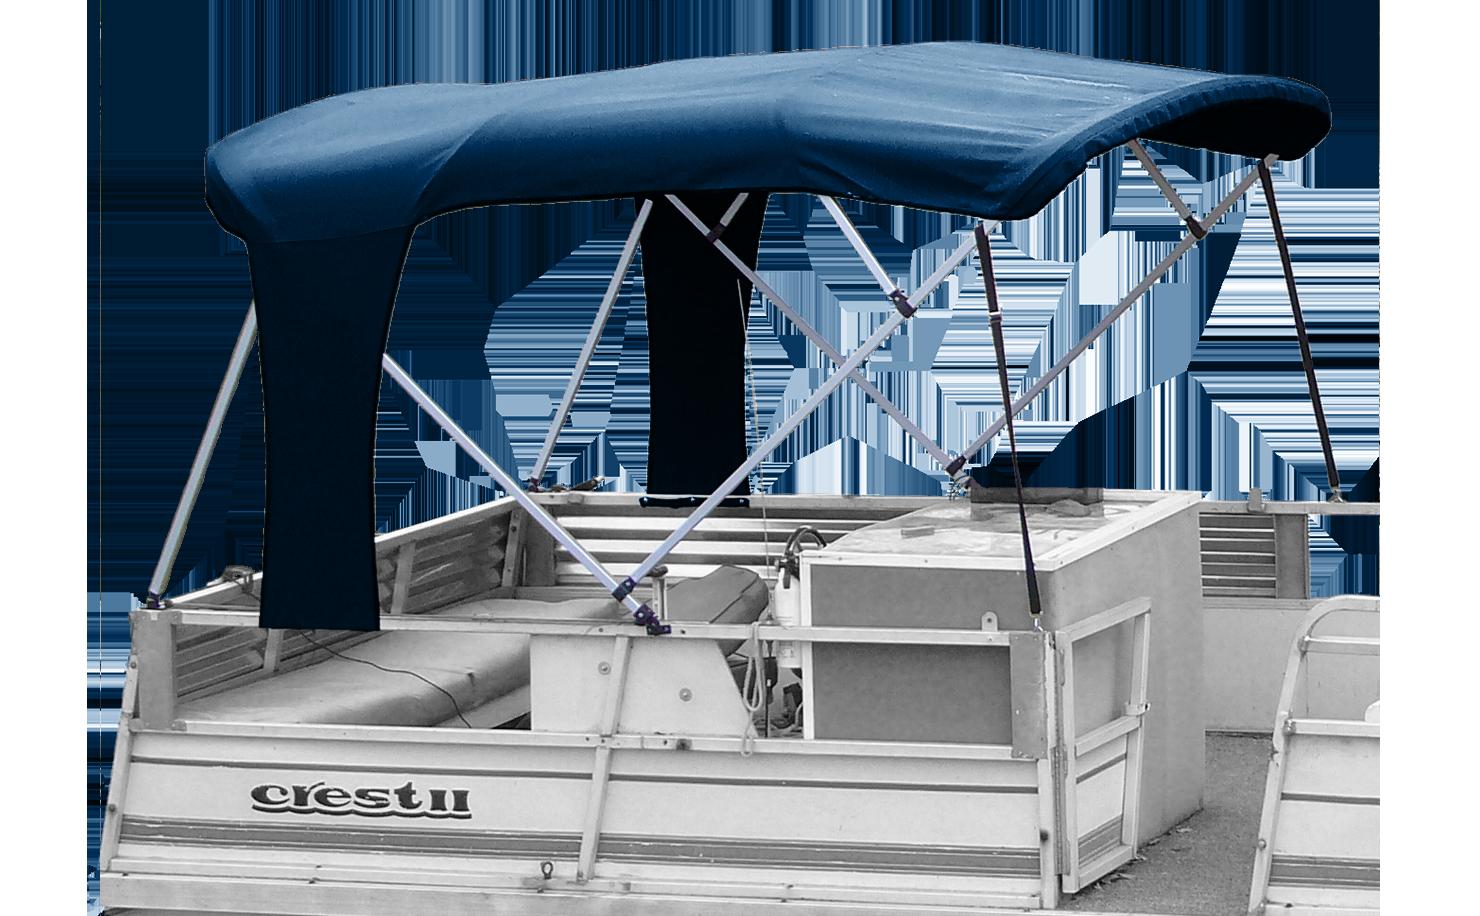 Pontoon boat category